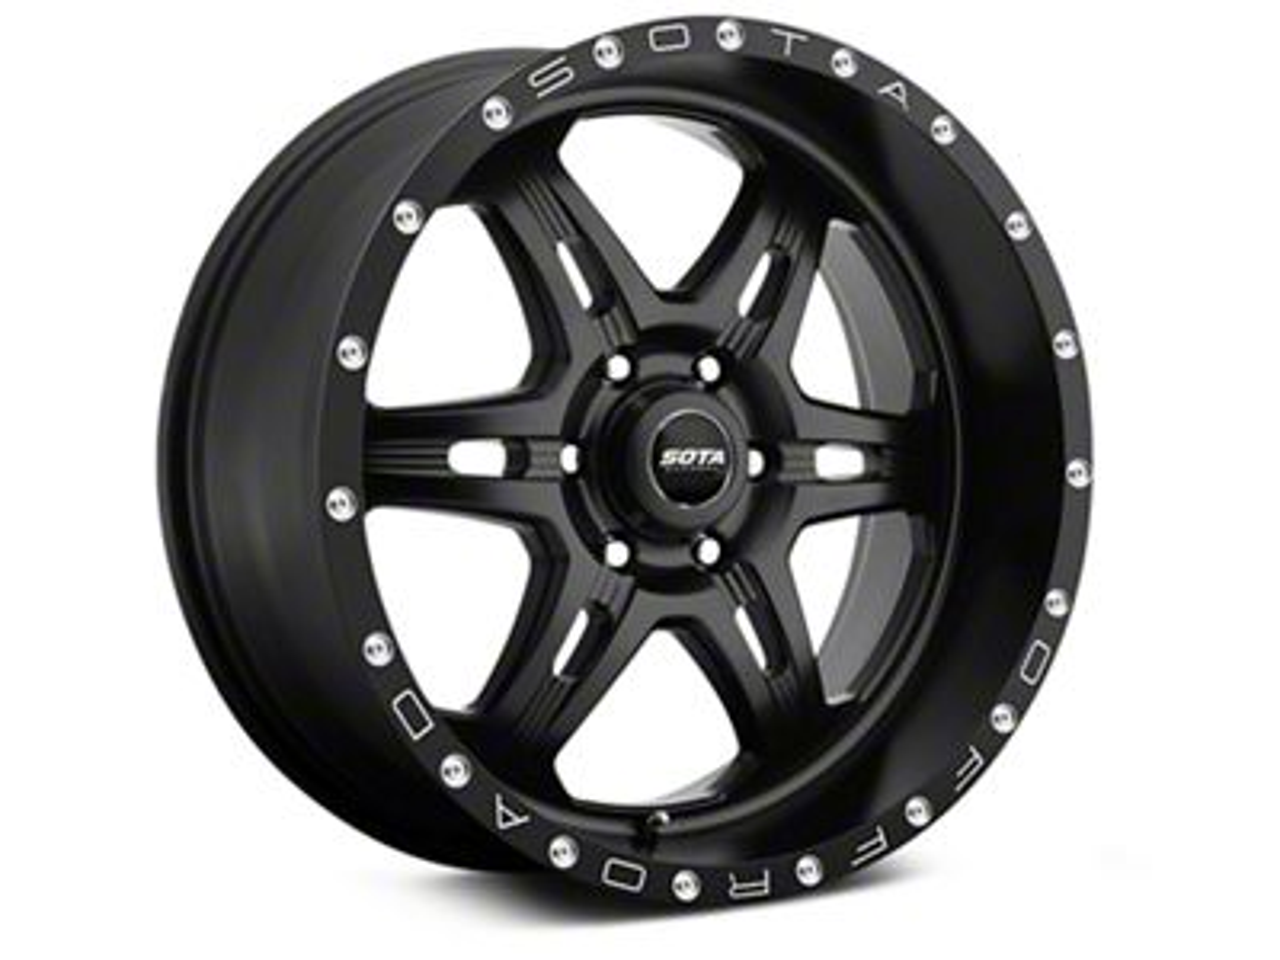 SOTA Off Road FITE Stealth Black 6-Lug Wheel - 20x9 (07-18 Sierra 1500)